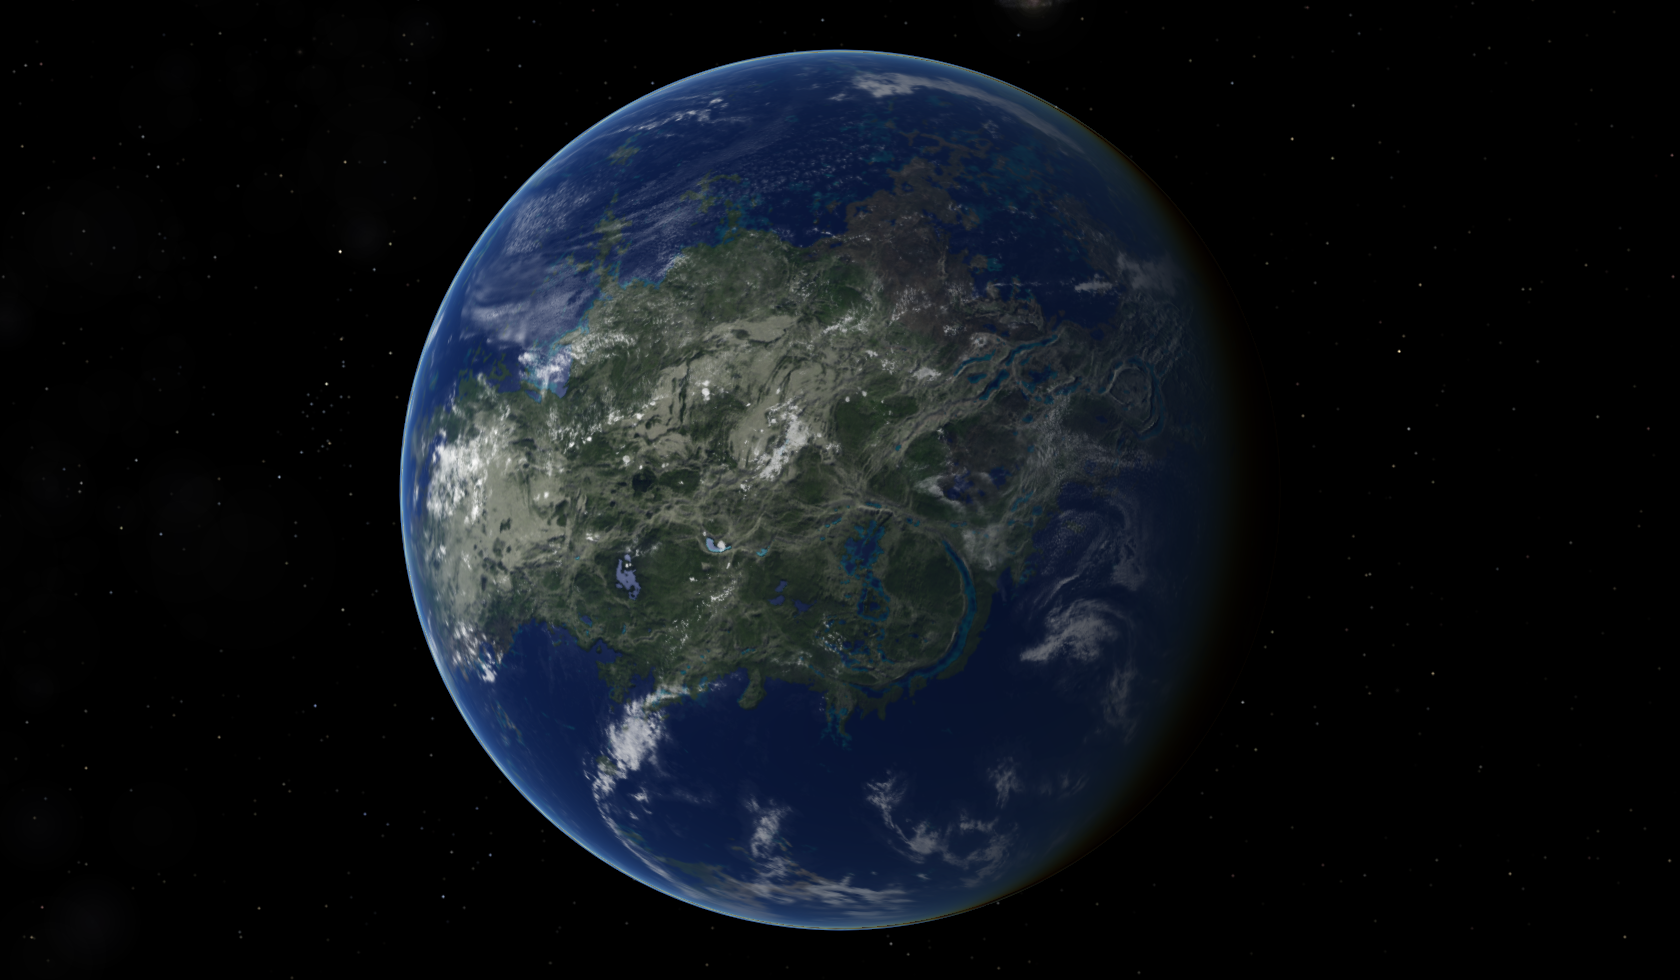 terraform mars planet - photo #16